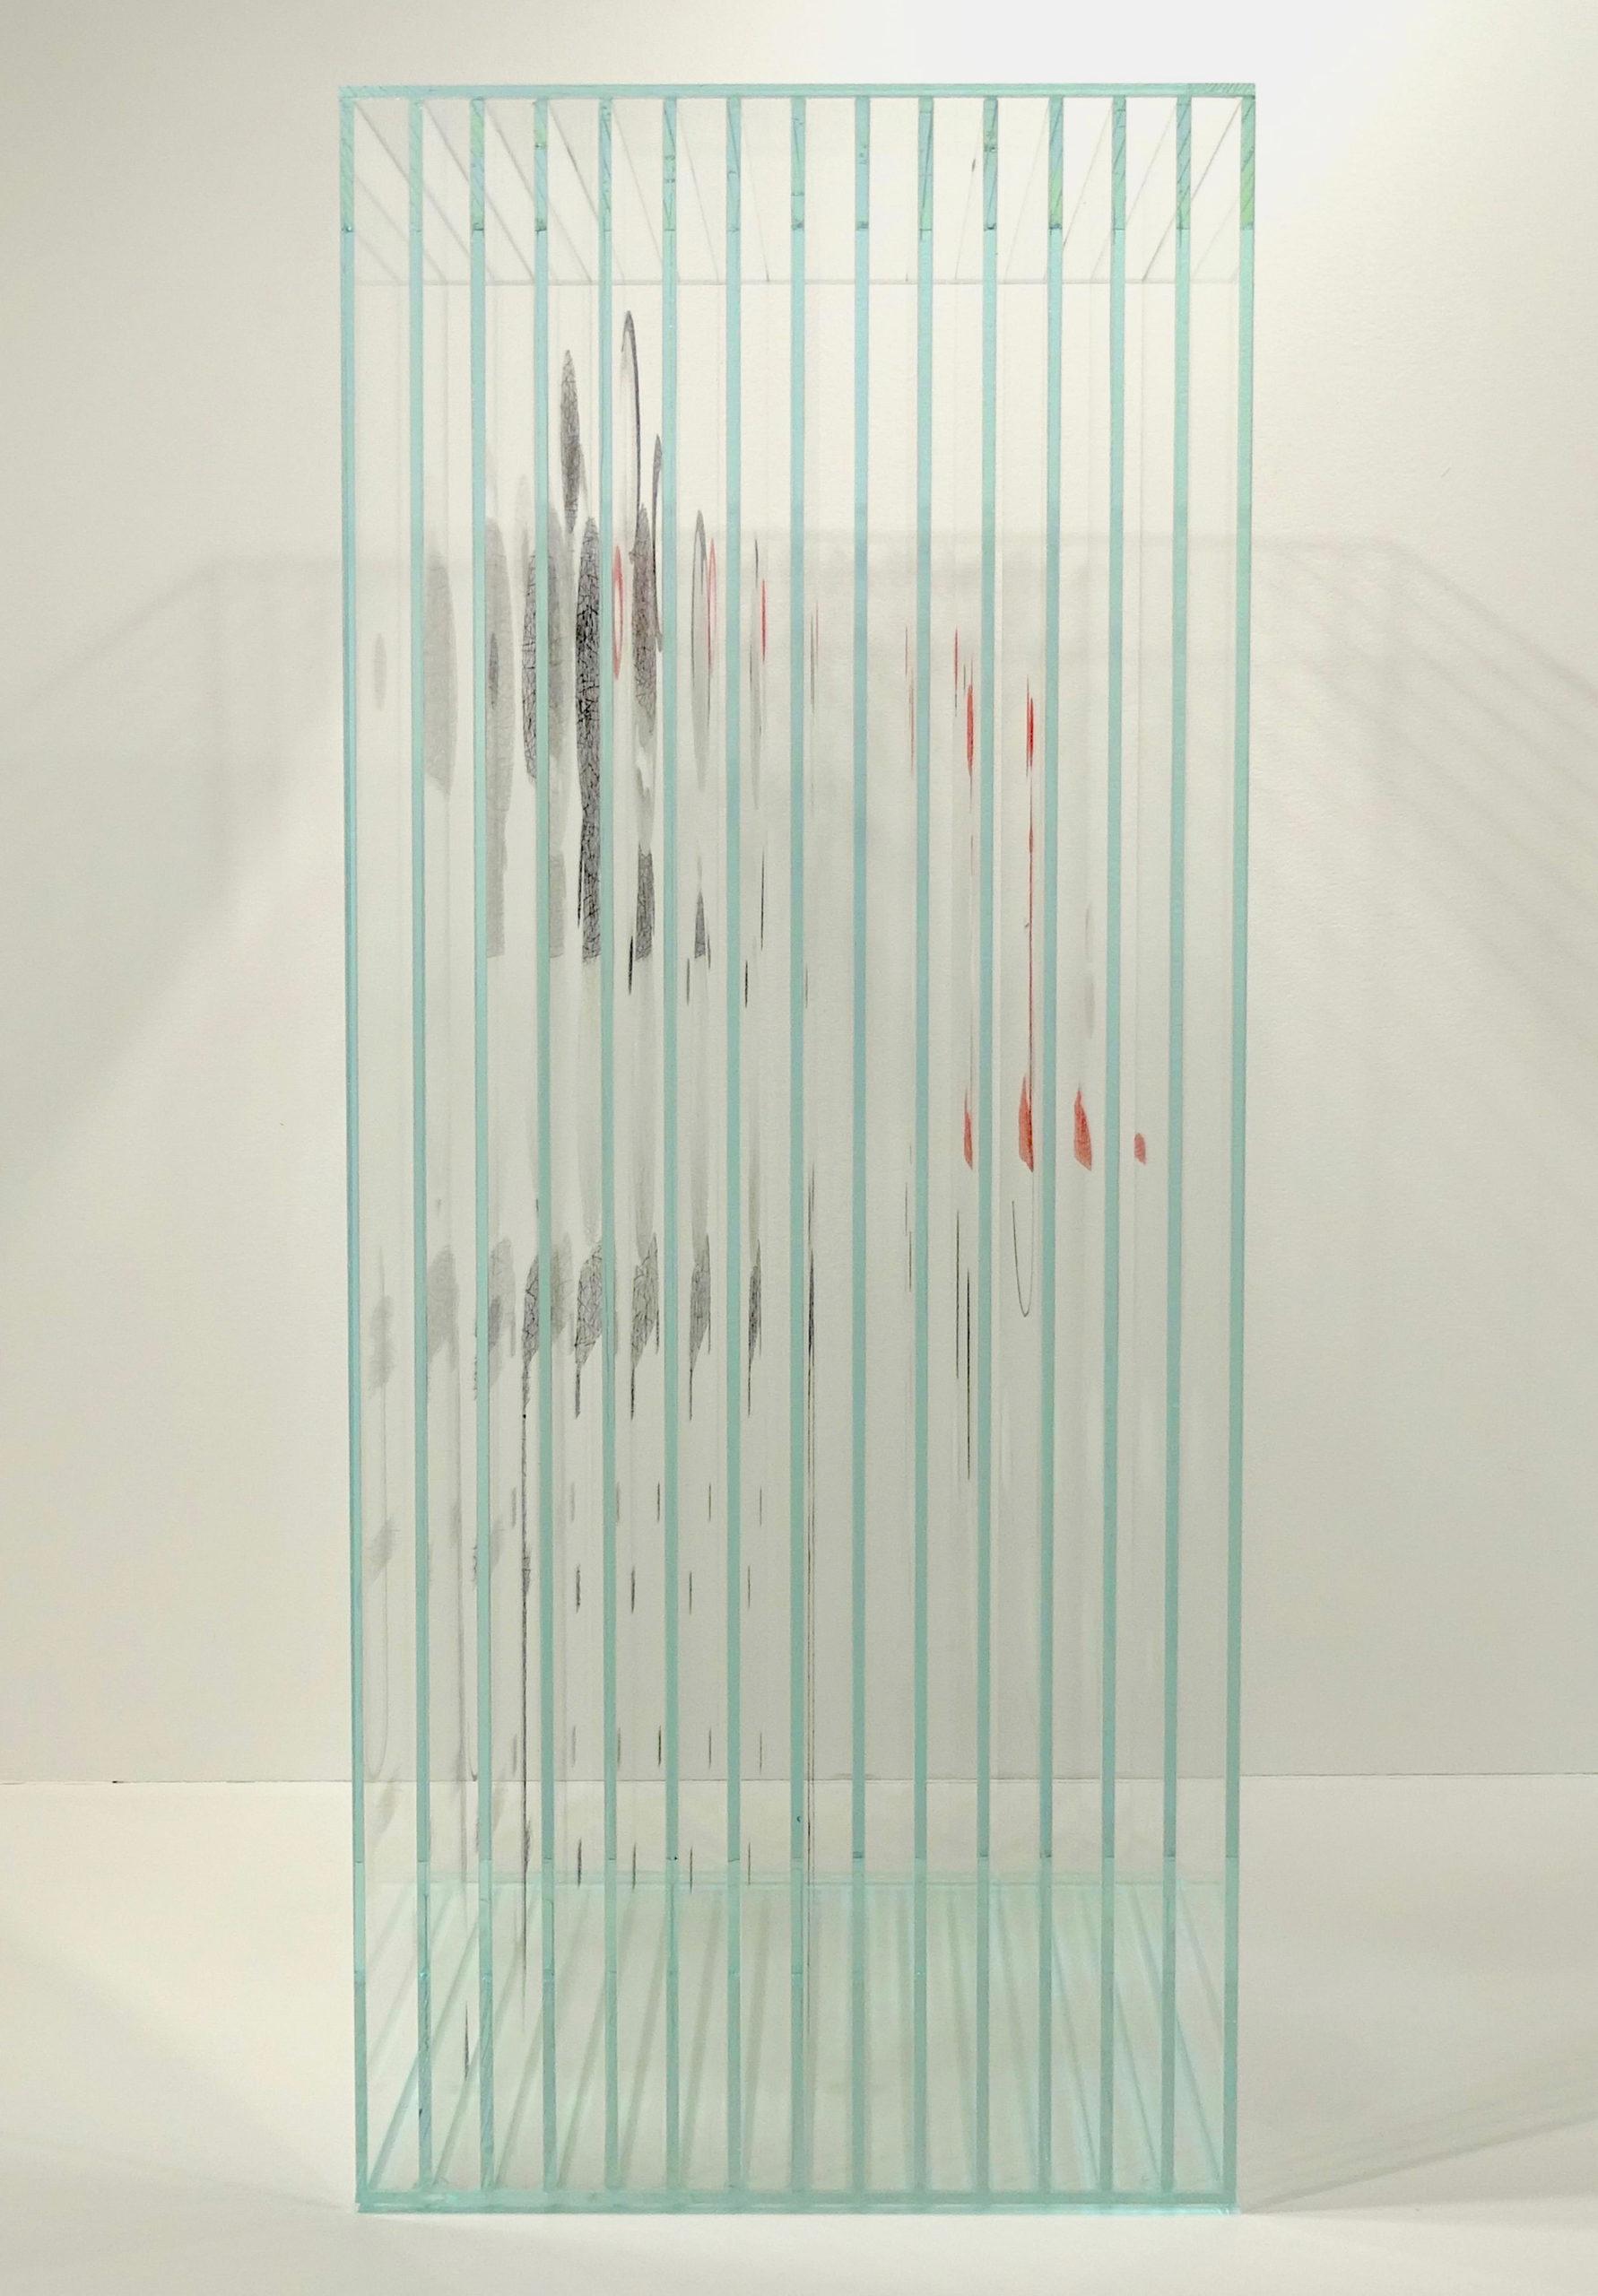 1-sebastien-creteur-DBAF-d-galerie-bettina-art-contemporain-paris.jpg